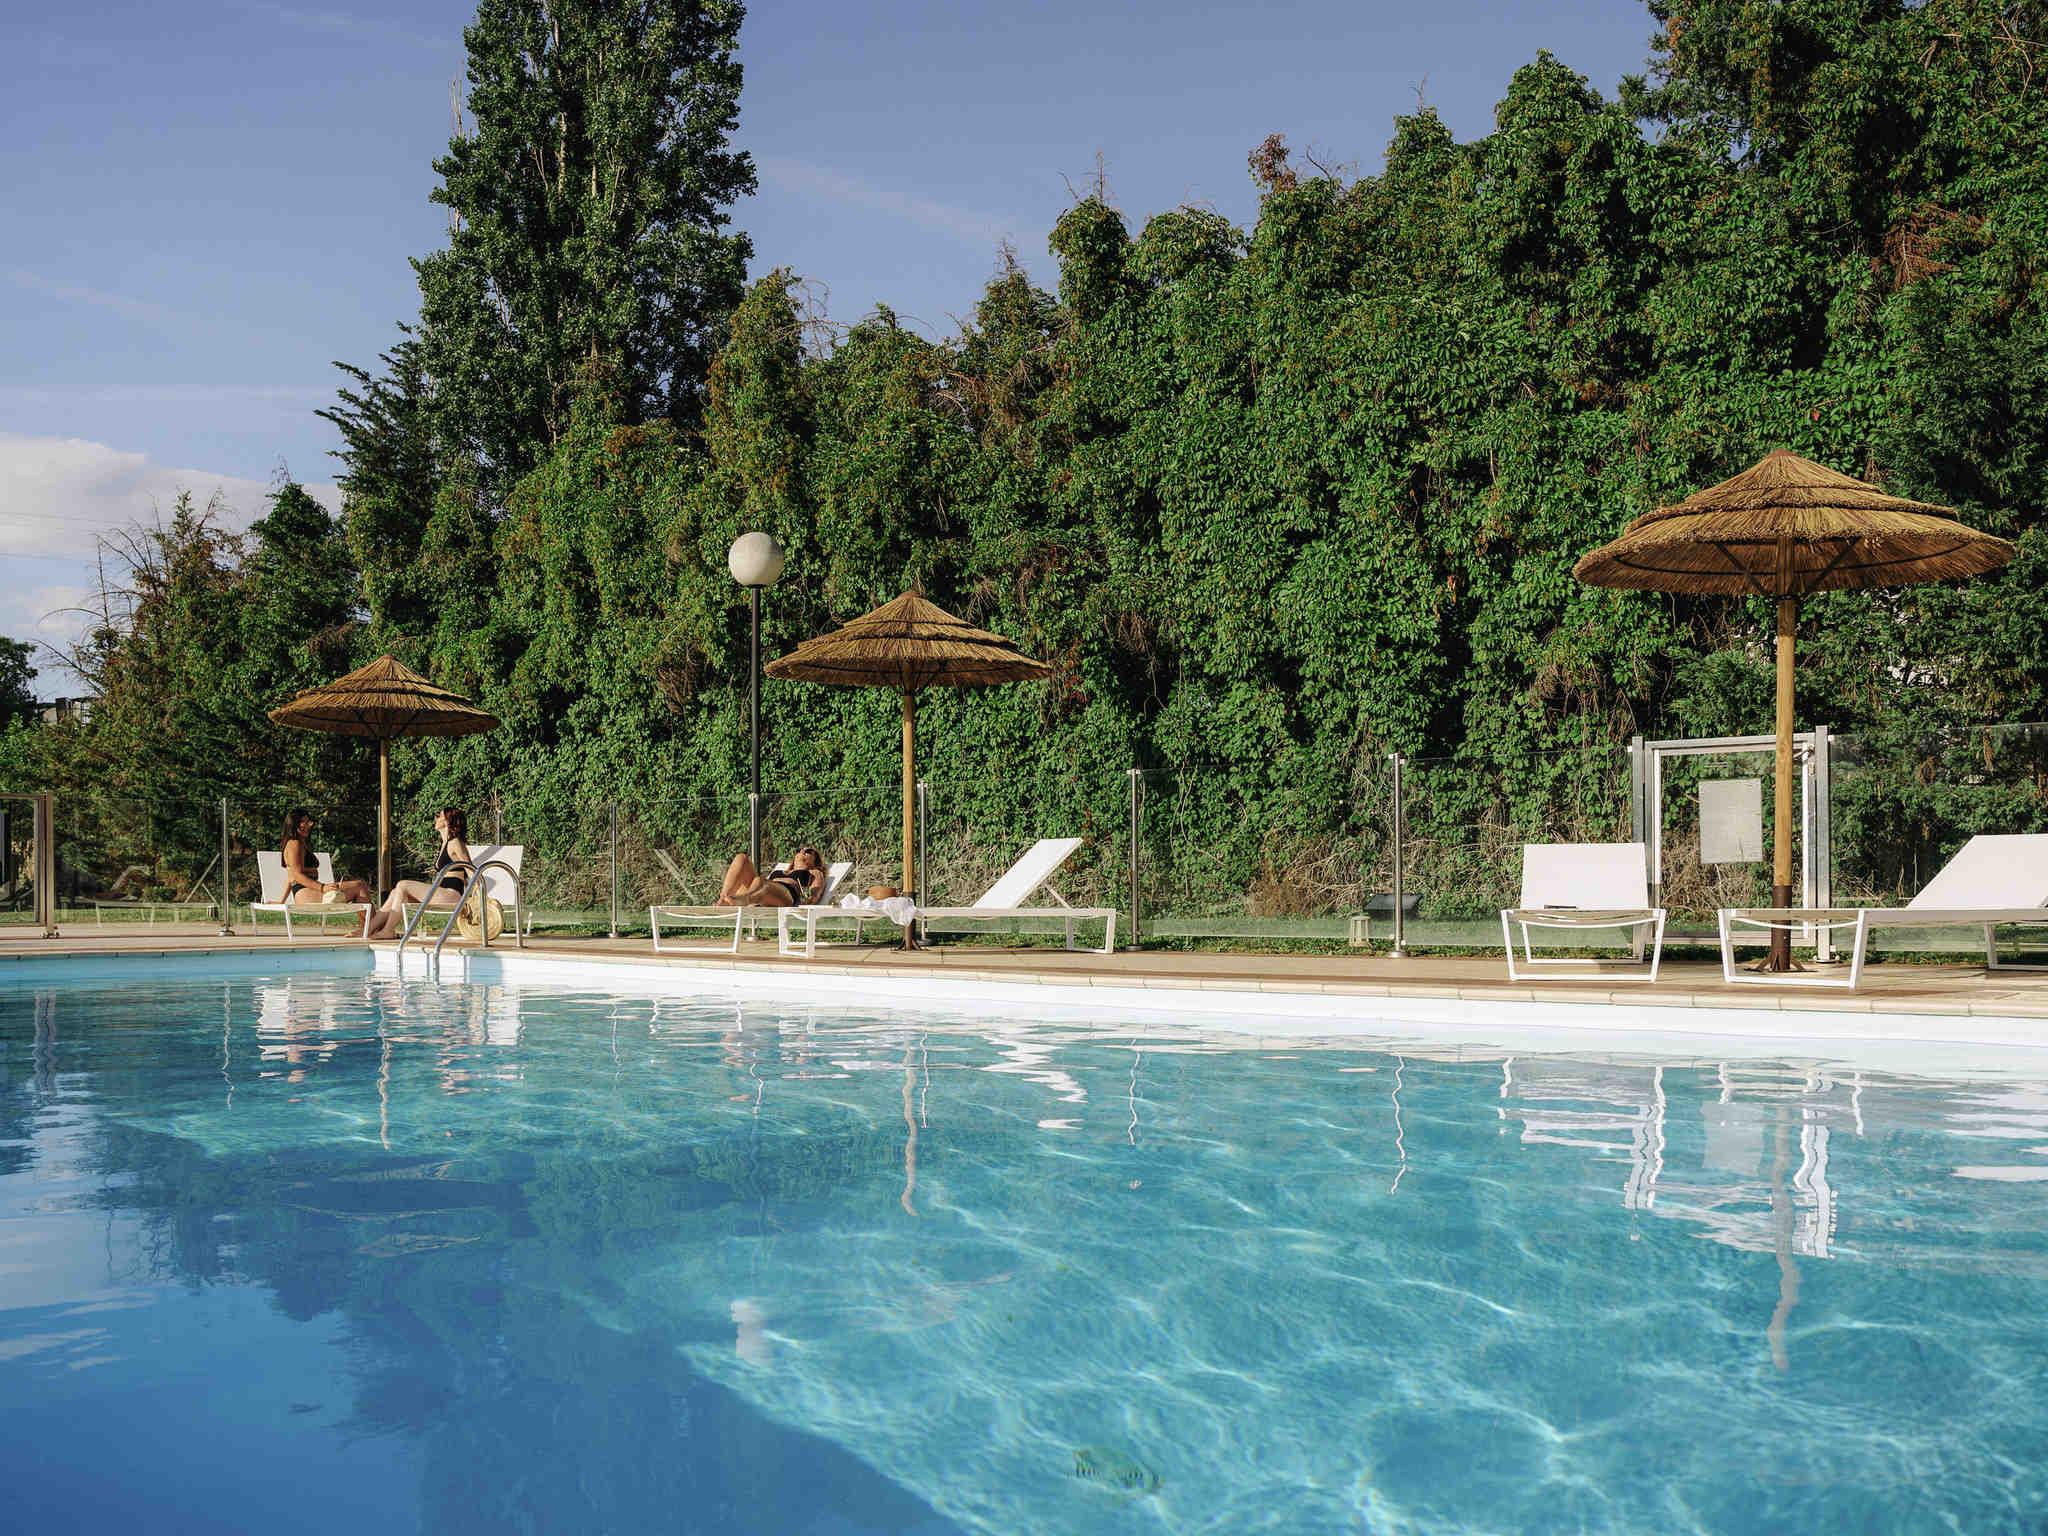 Hotel – Hotel Mercure Valence Sur